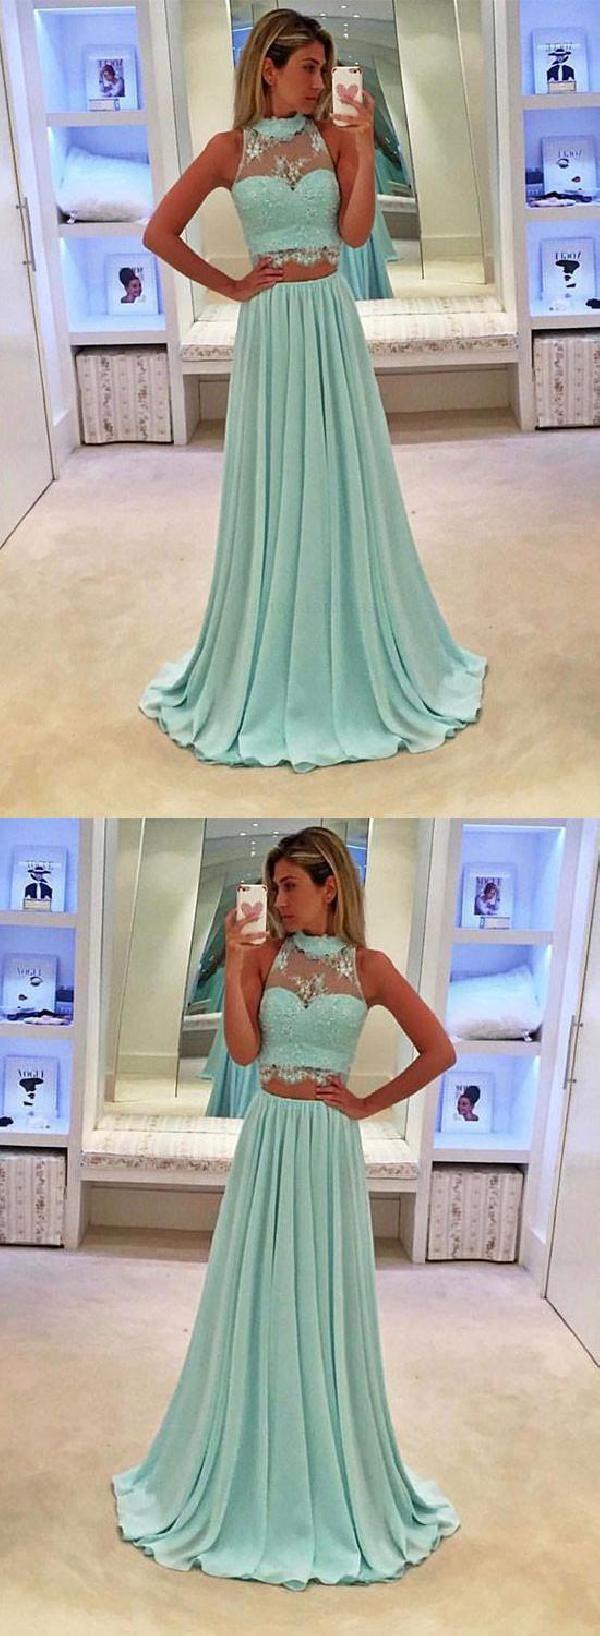 Customized beautiful long bridesmaid dress lace prom dresses prom